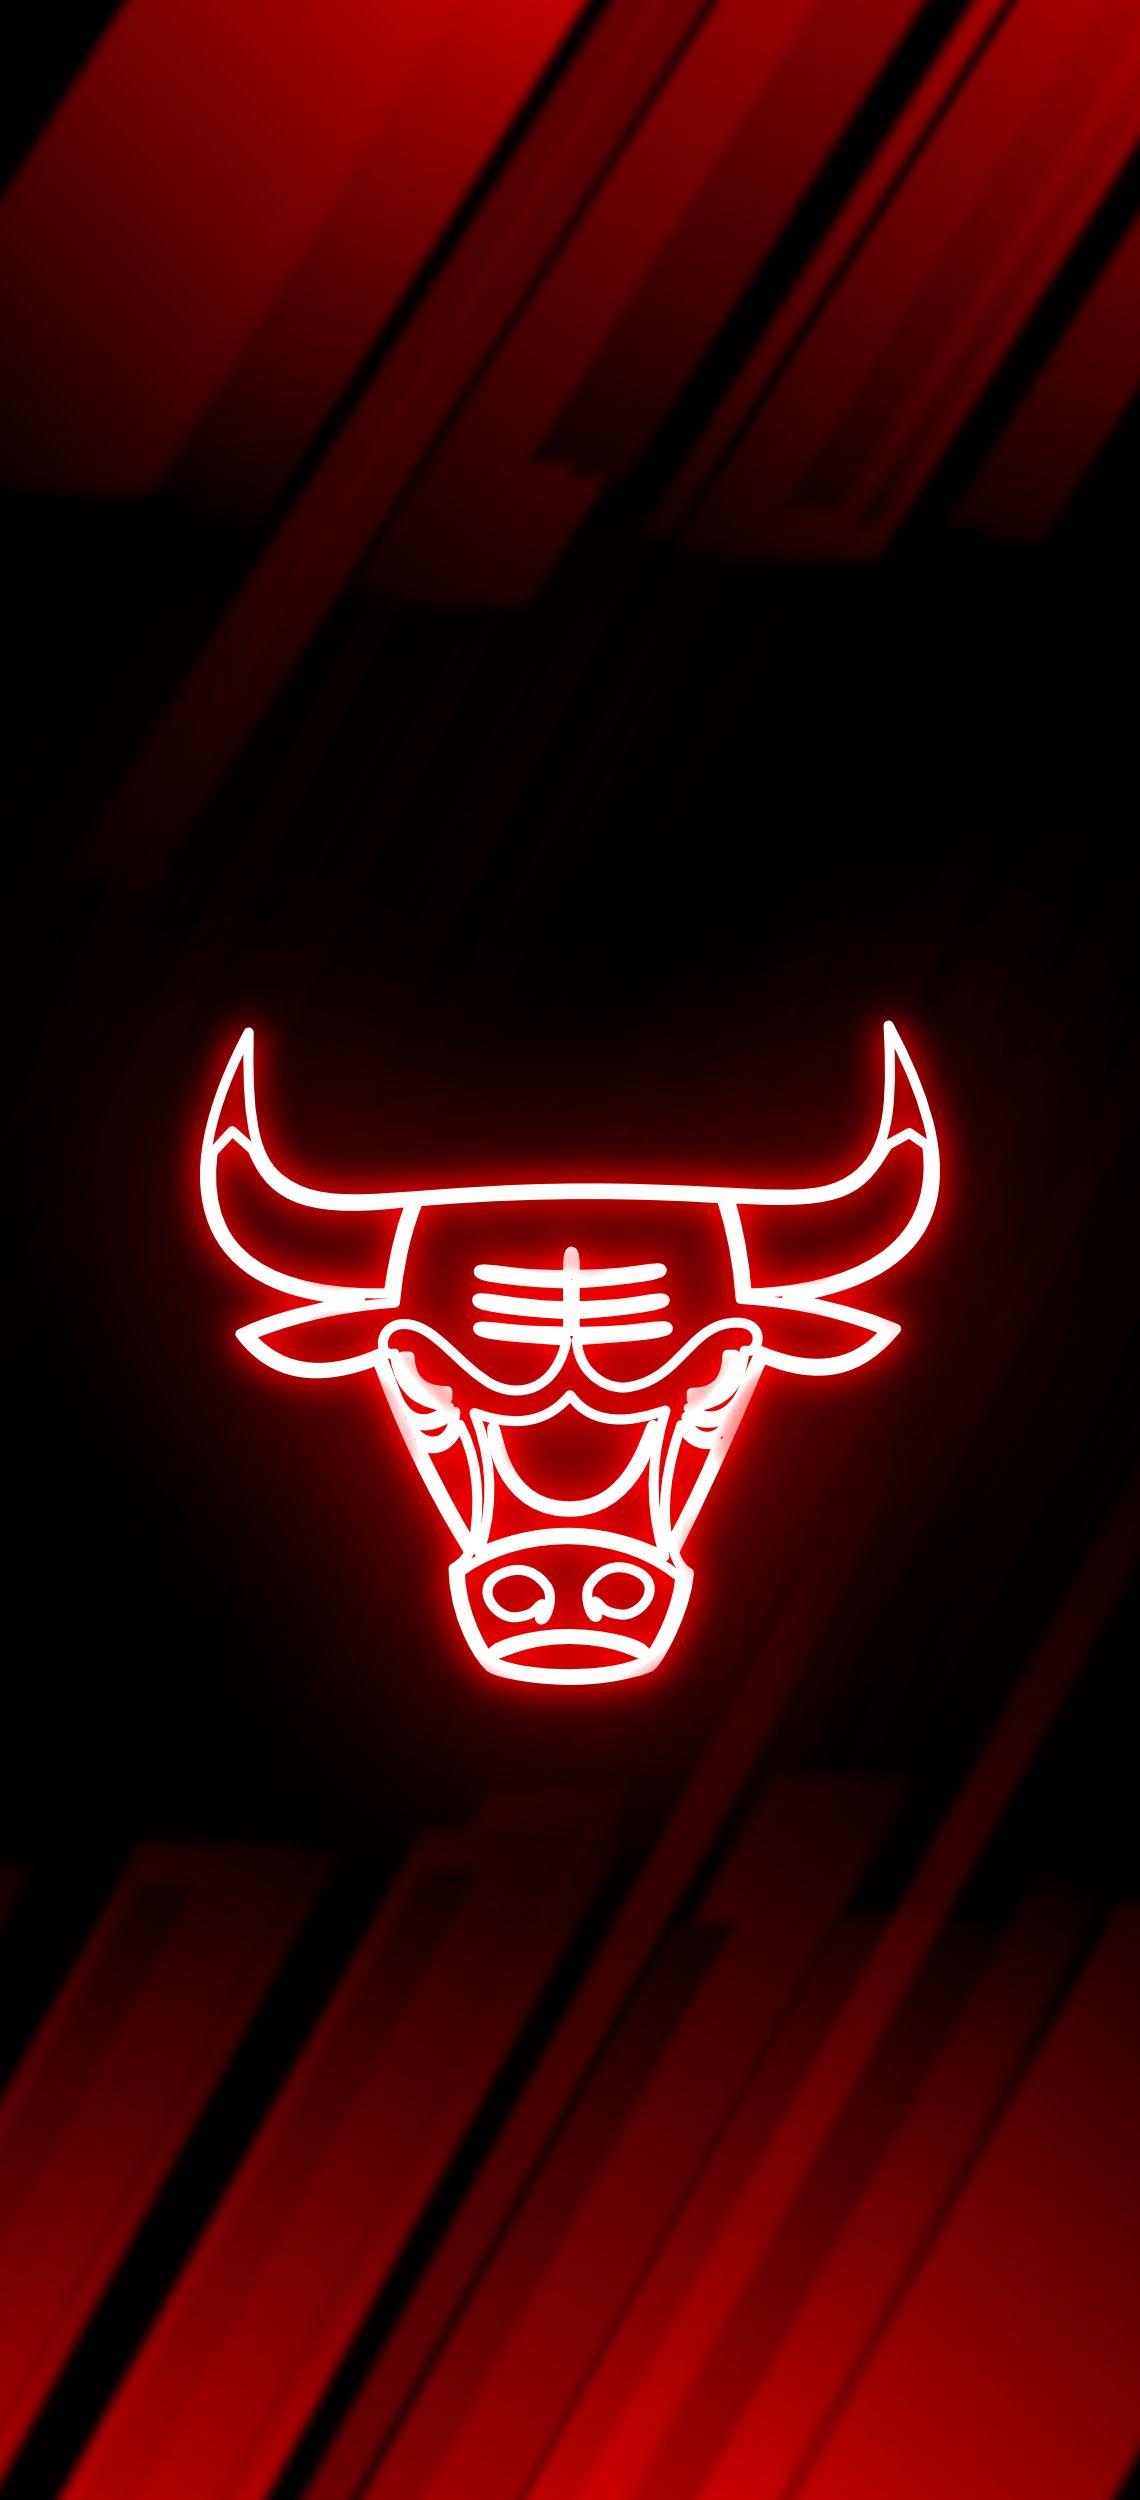 Chicago Bulls Logo Black 3083753 Hd Wallpaper Backgrounds Download